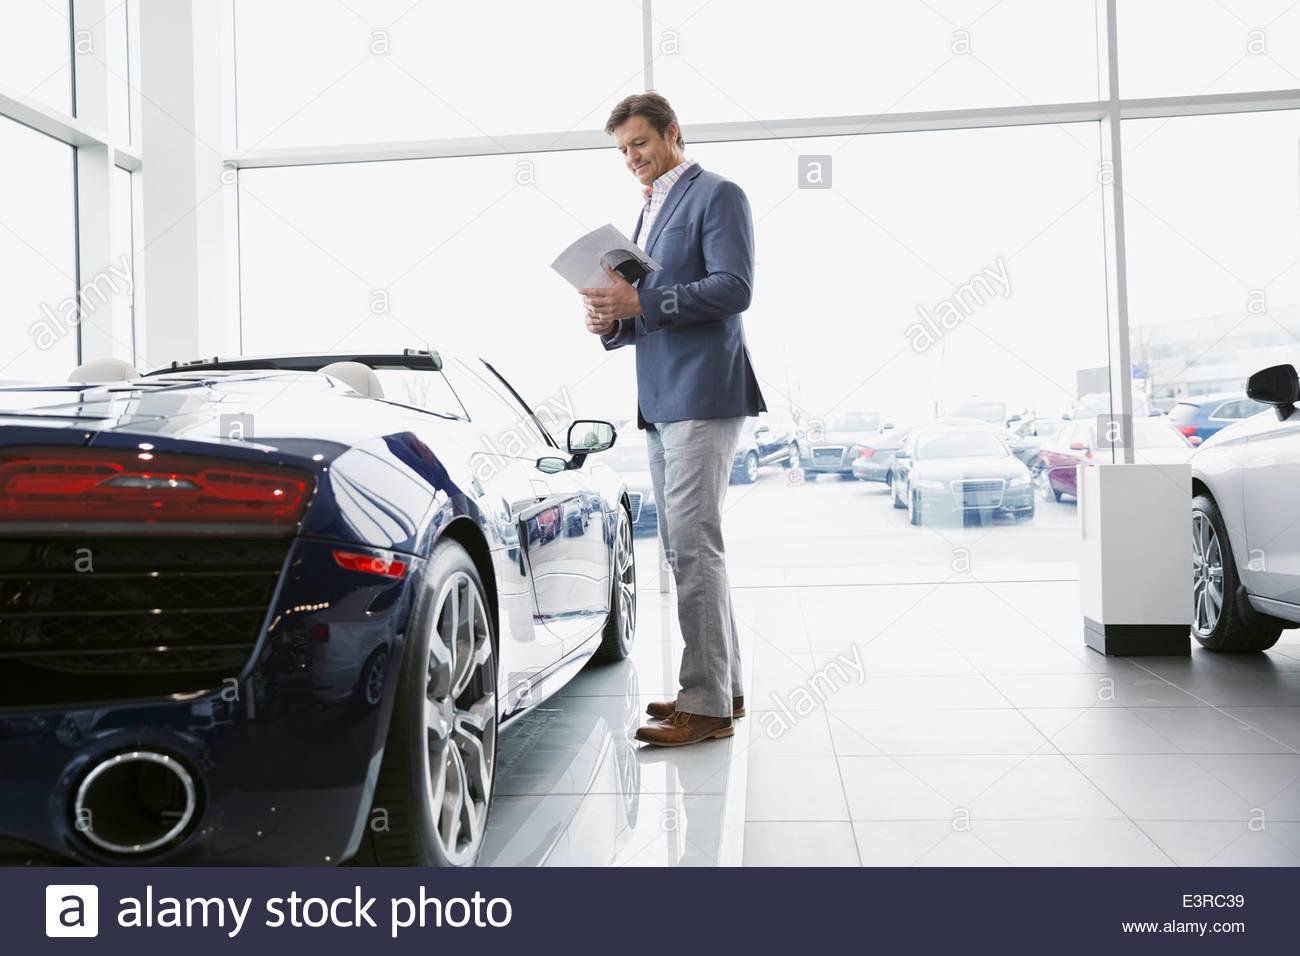 Man looking at convertible in car dealership showroom Stock Photo